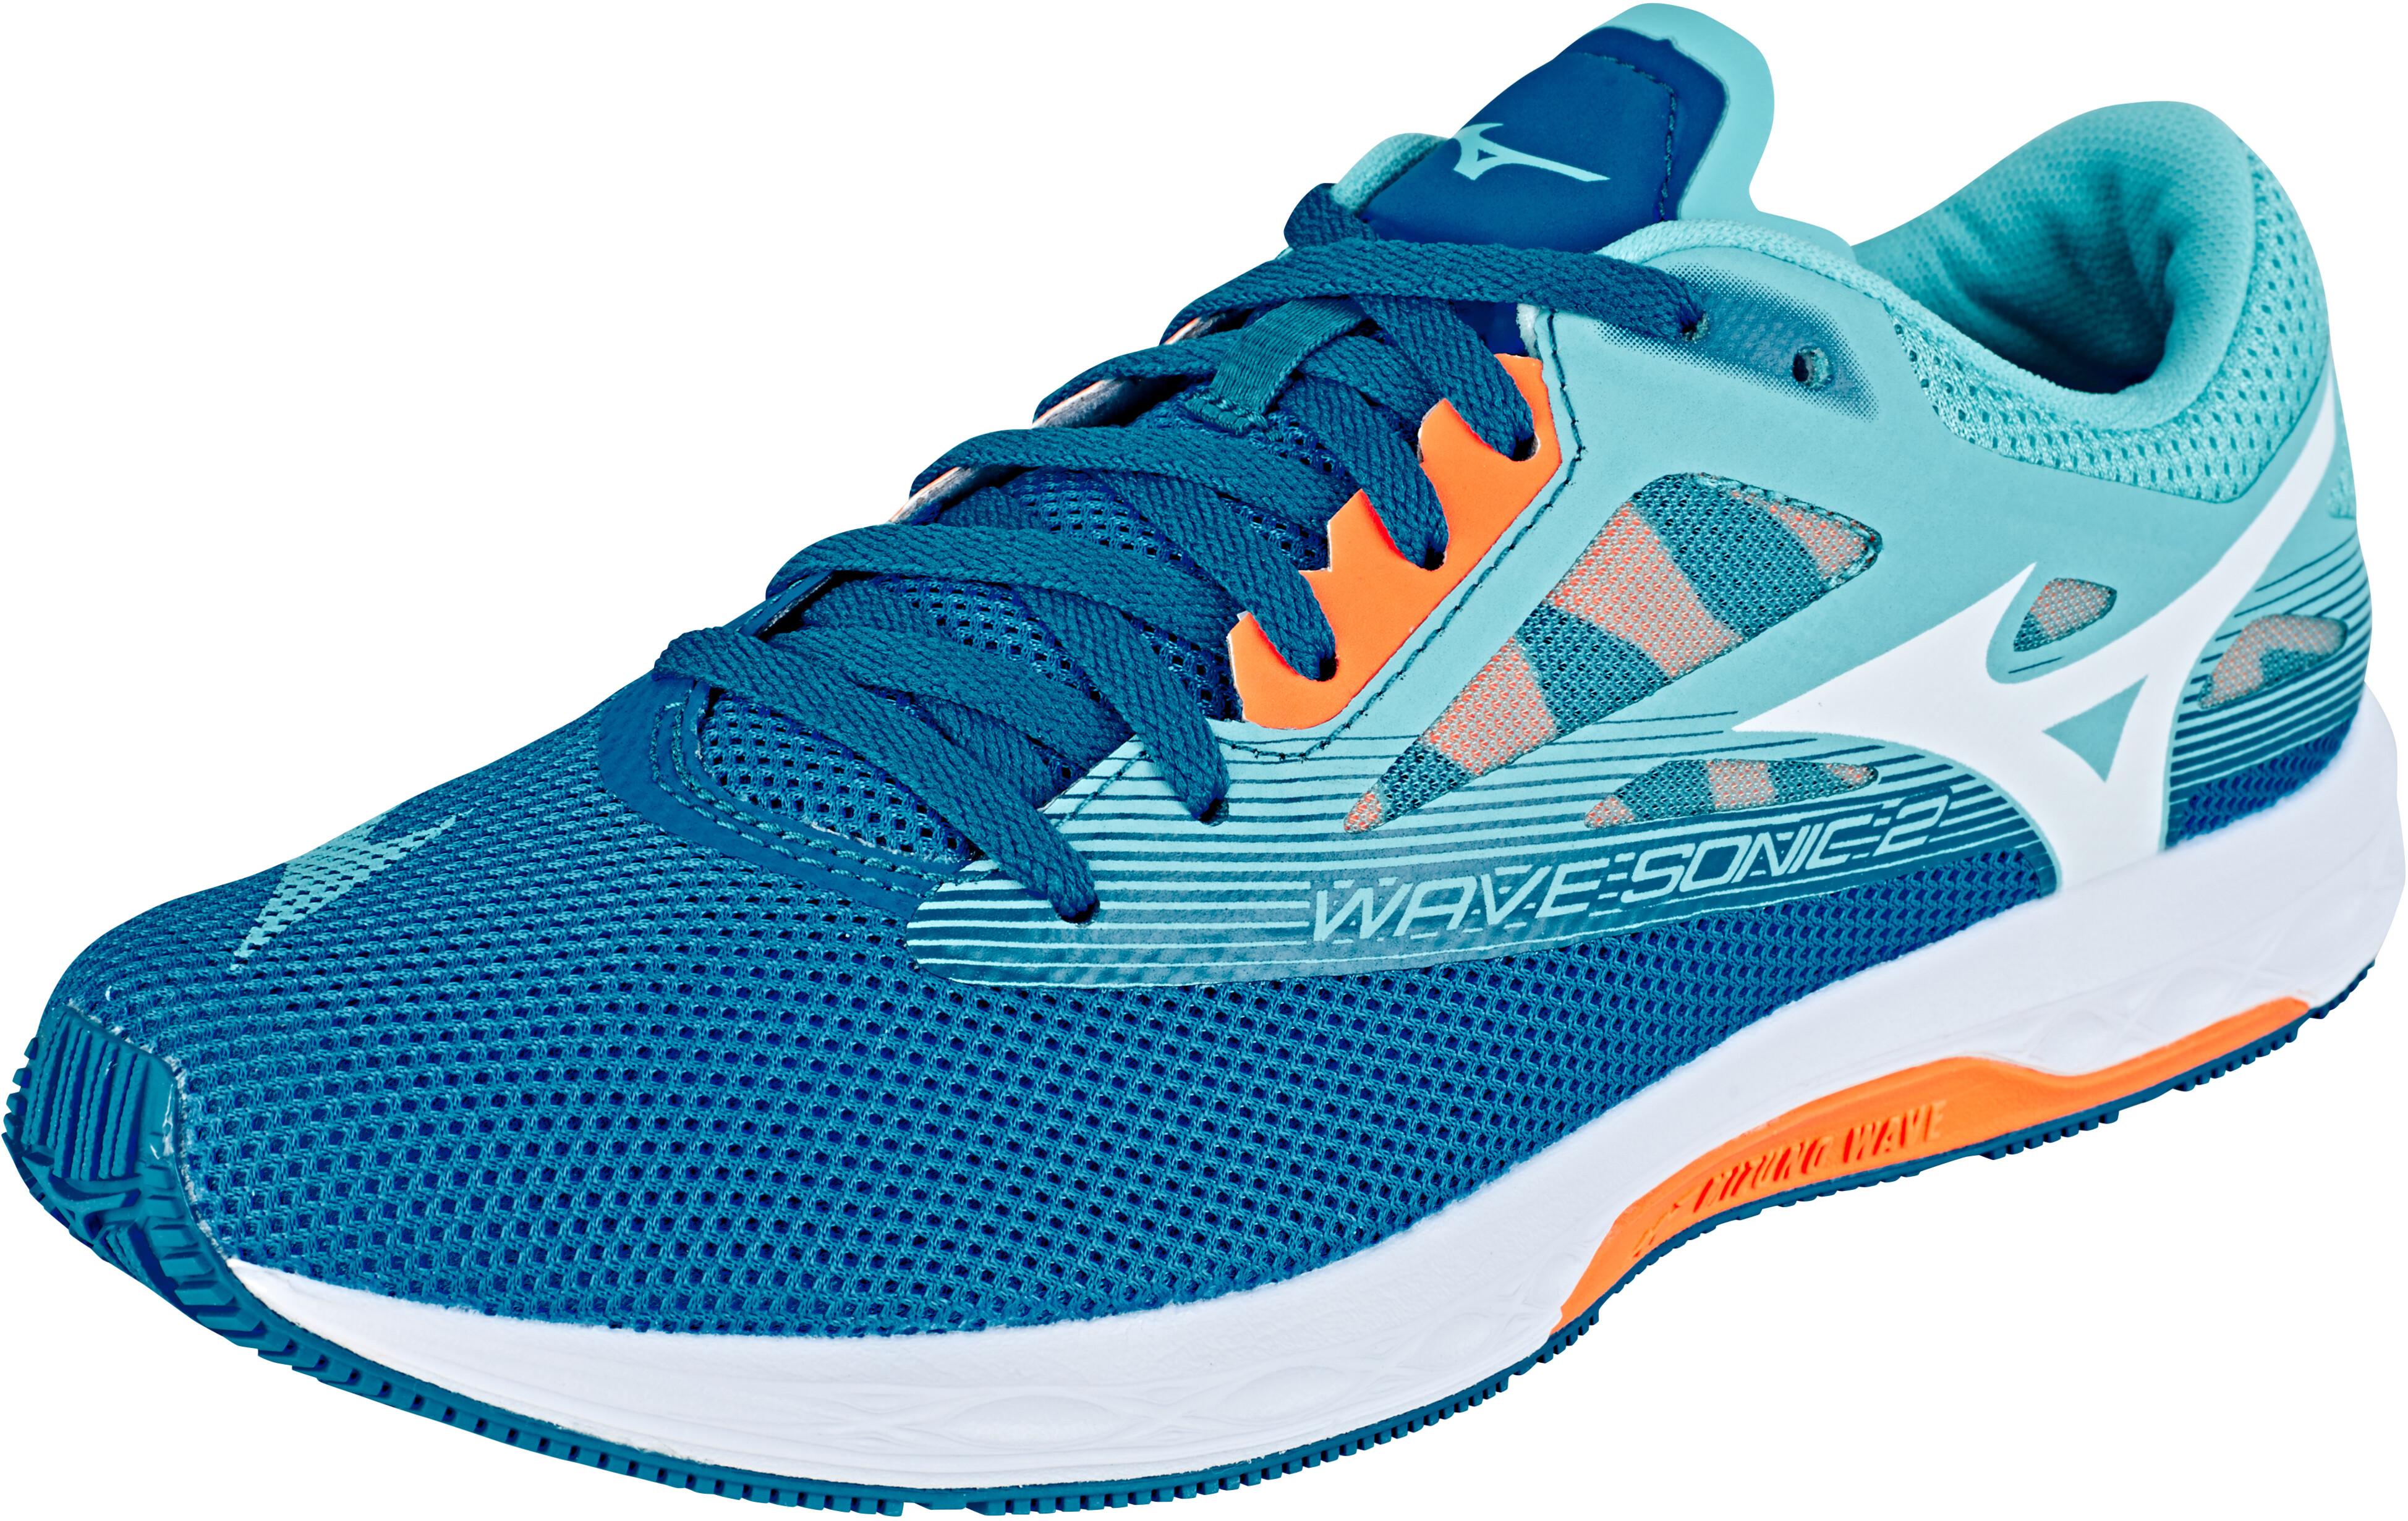 on sale a4e65 93eaf Mizuno Wave Sonic 2 - Chaussures running Femme - bleu blanc